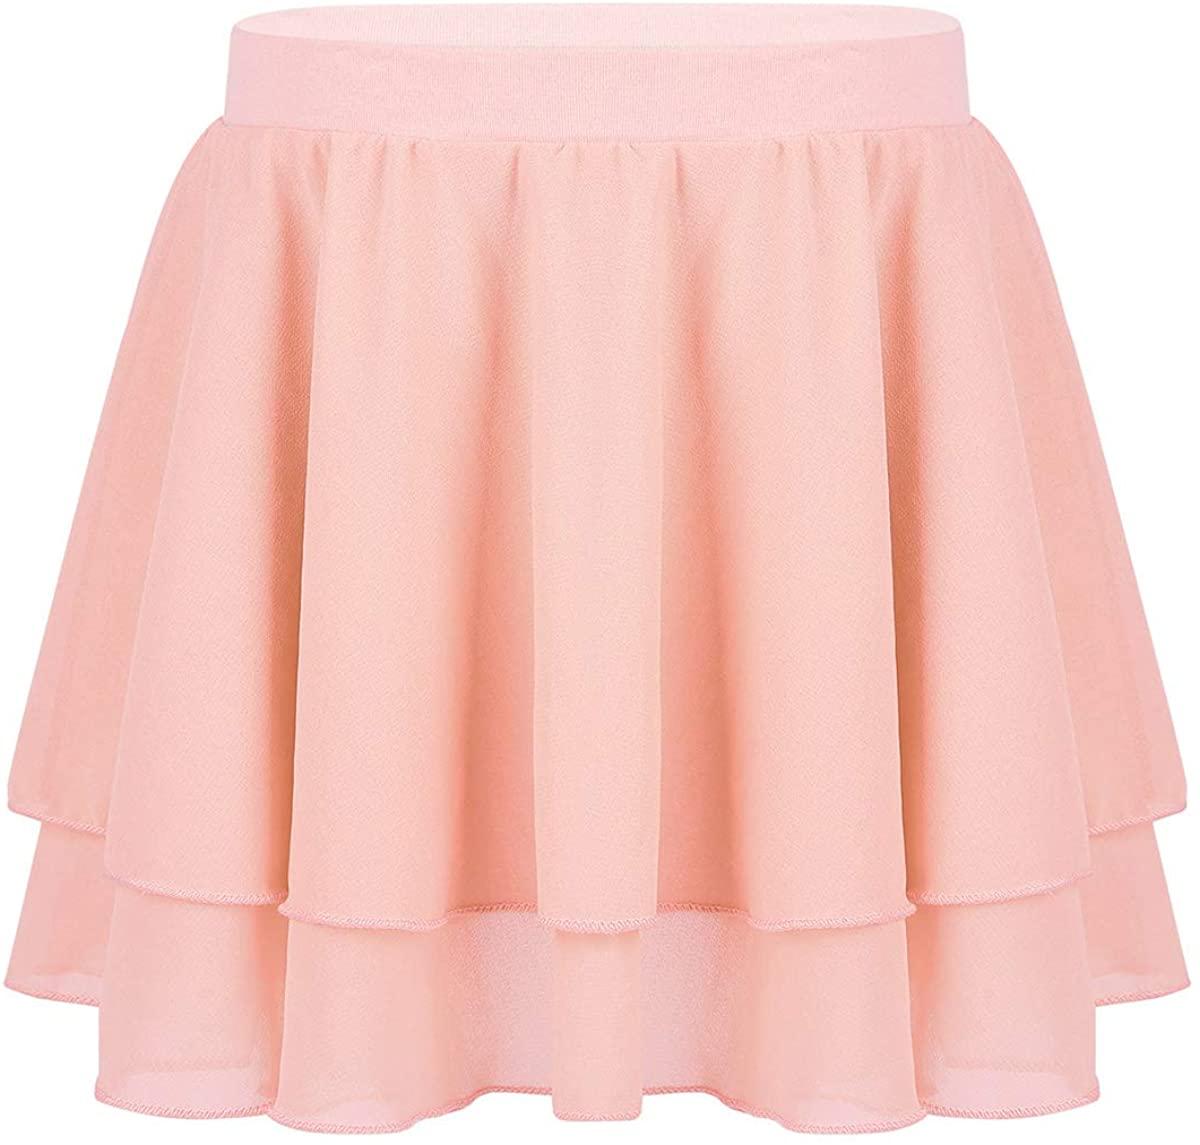 winying Girls Basic Chiffon Tiered Mini Elastic Waistband Pull On Skirt Ballet Dancewear